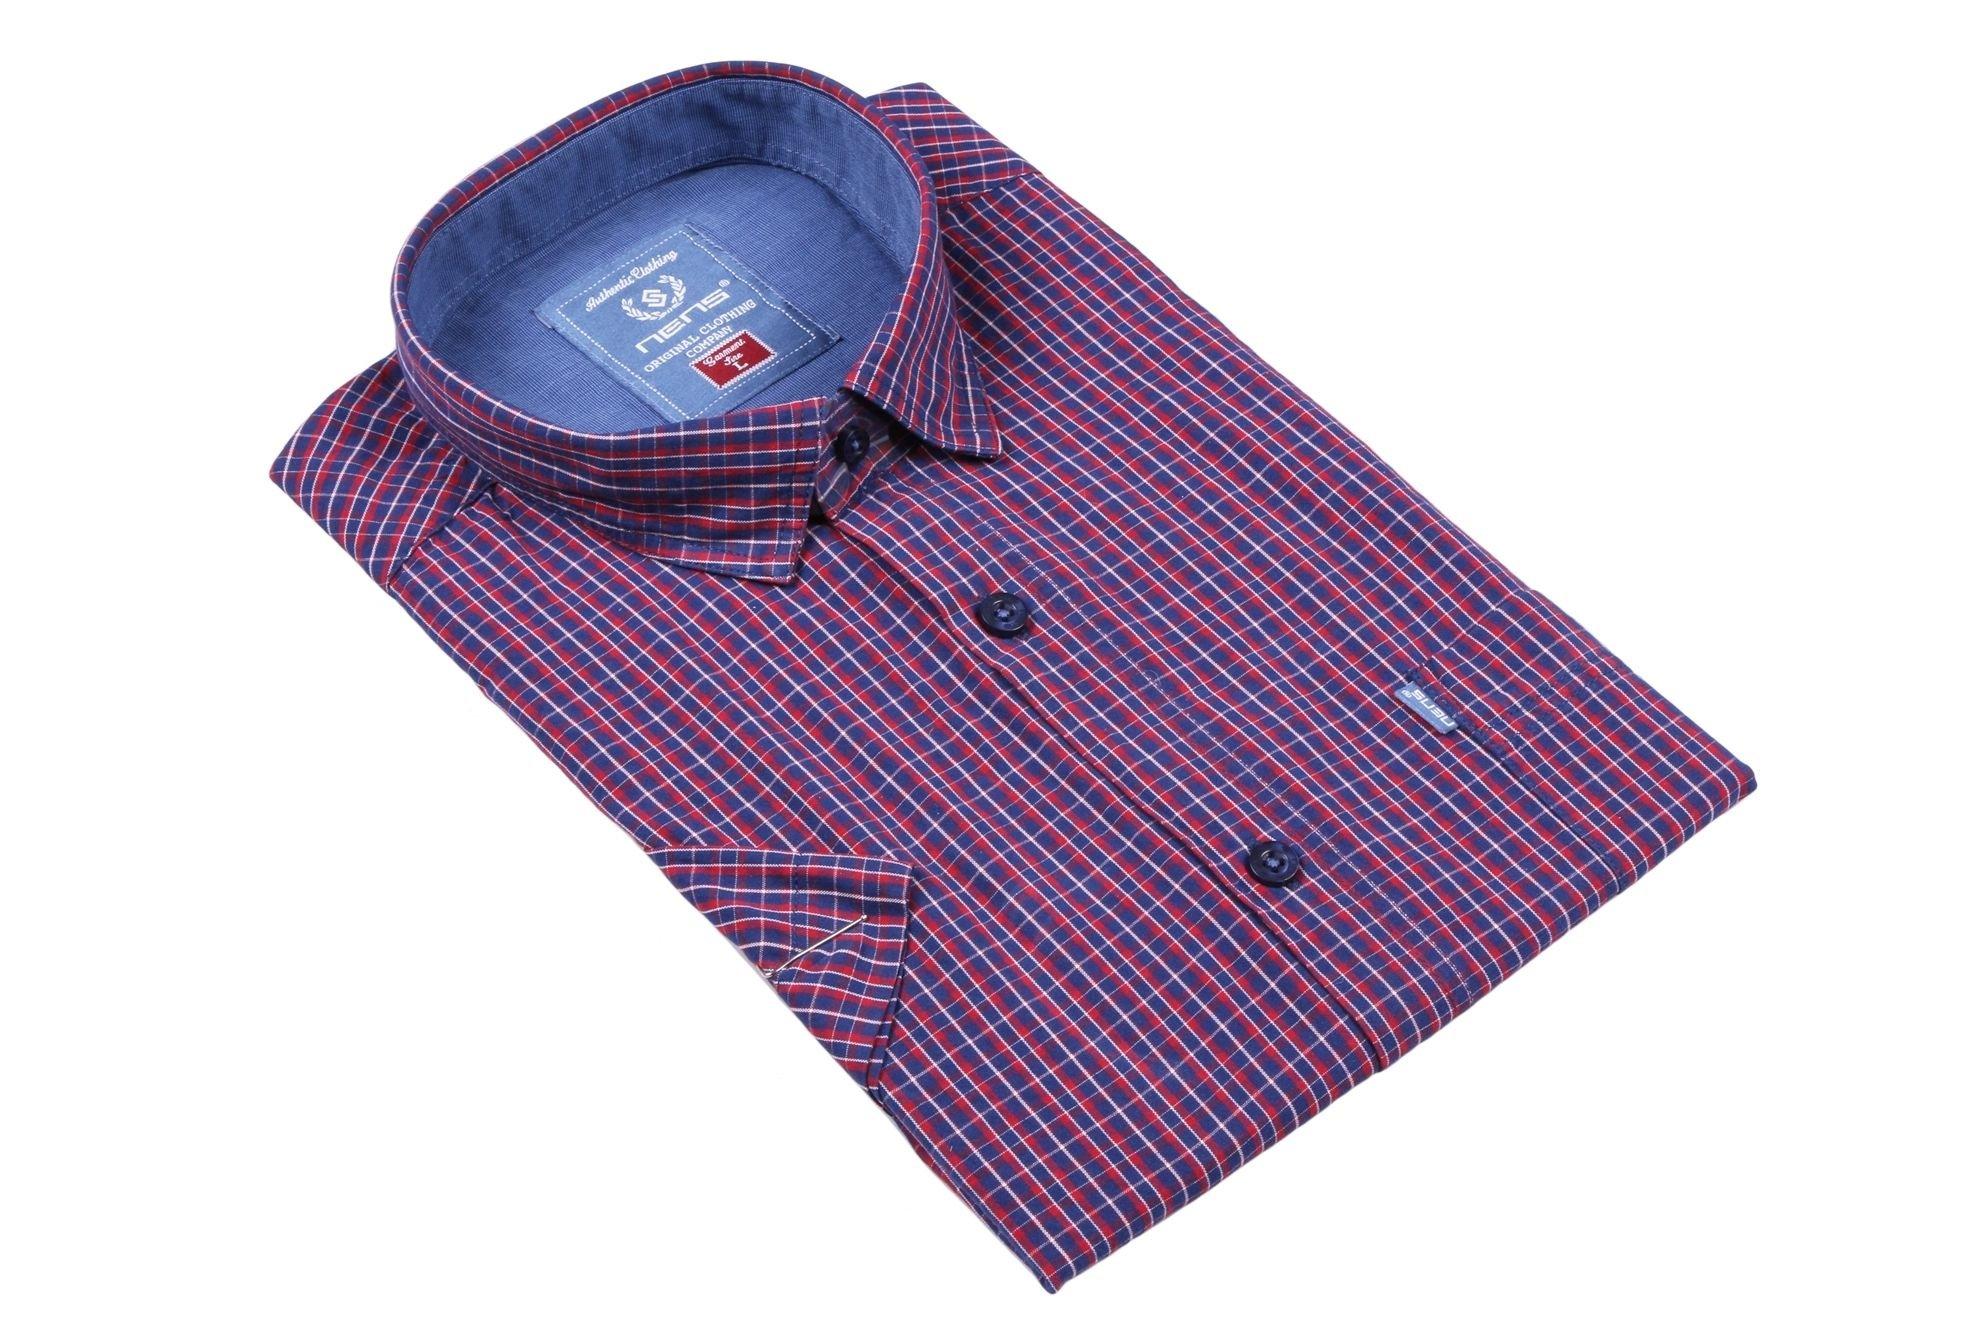 Клетчатая рубашка с коротким рукавом (Арт. T 2313K)